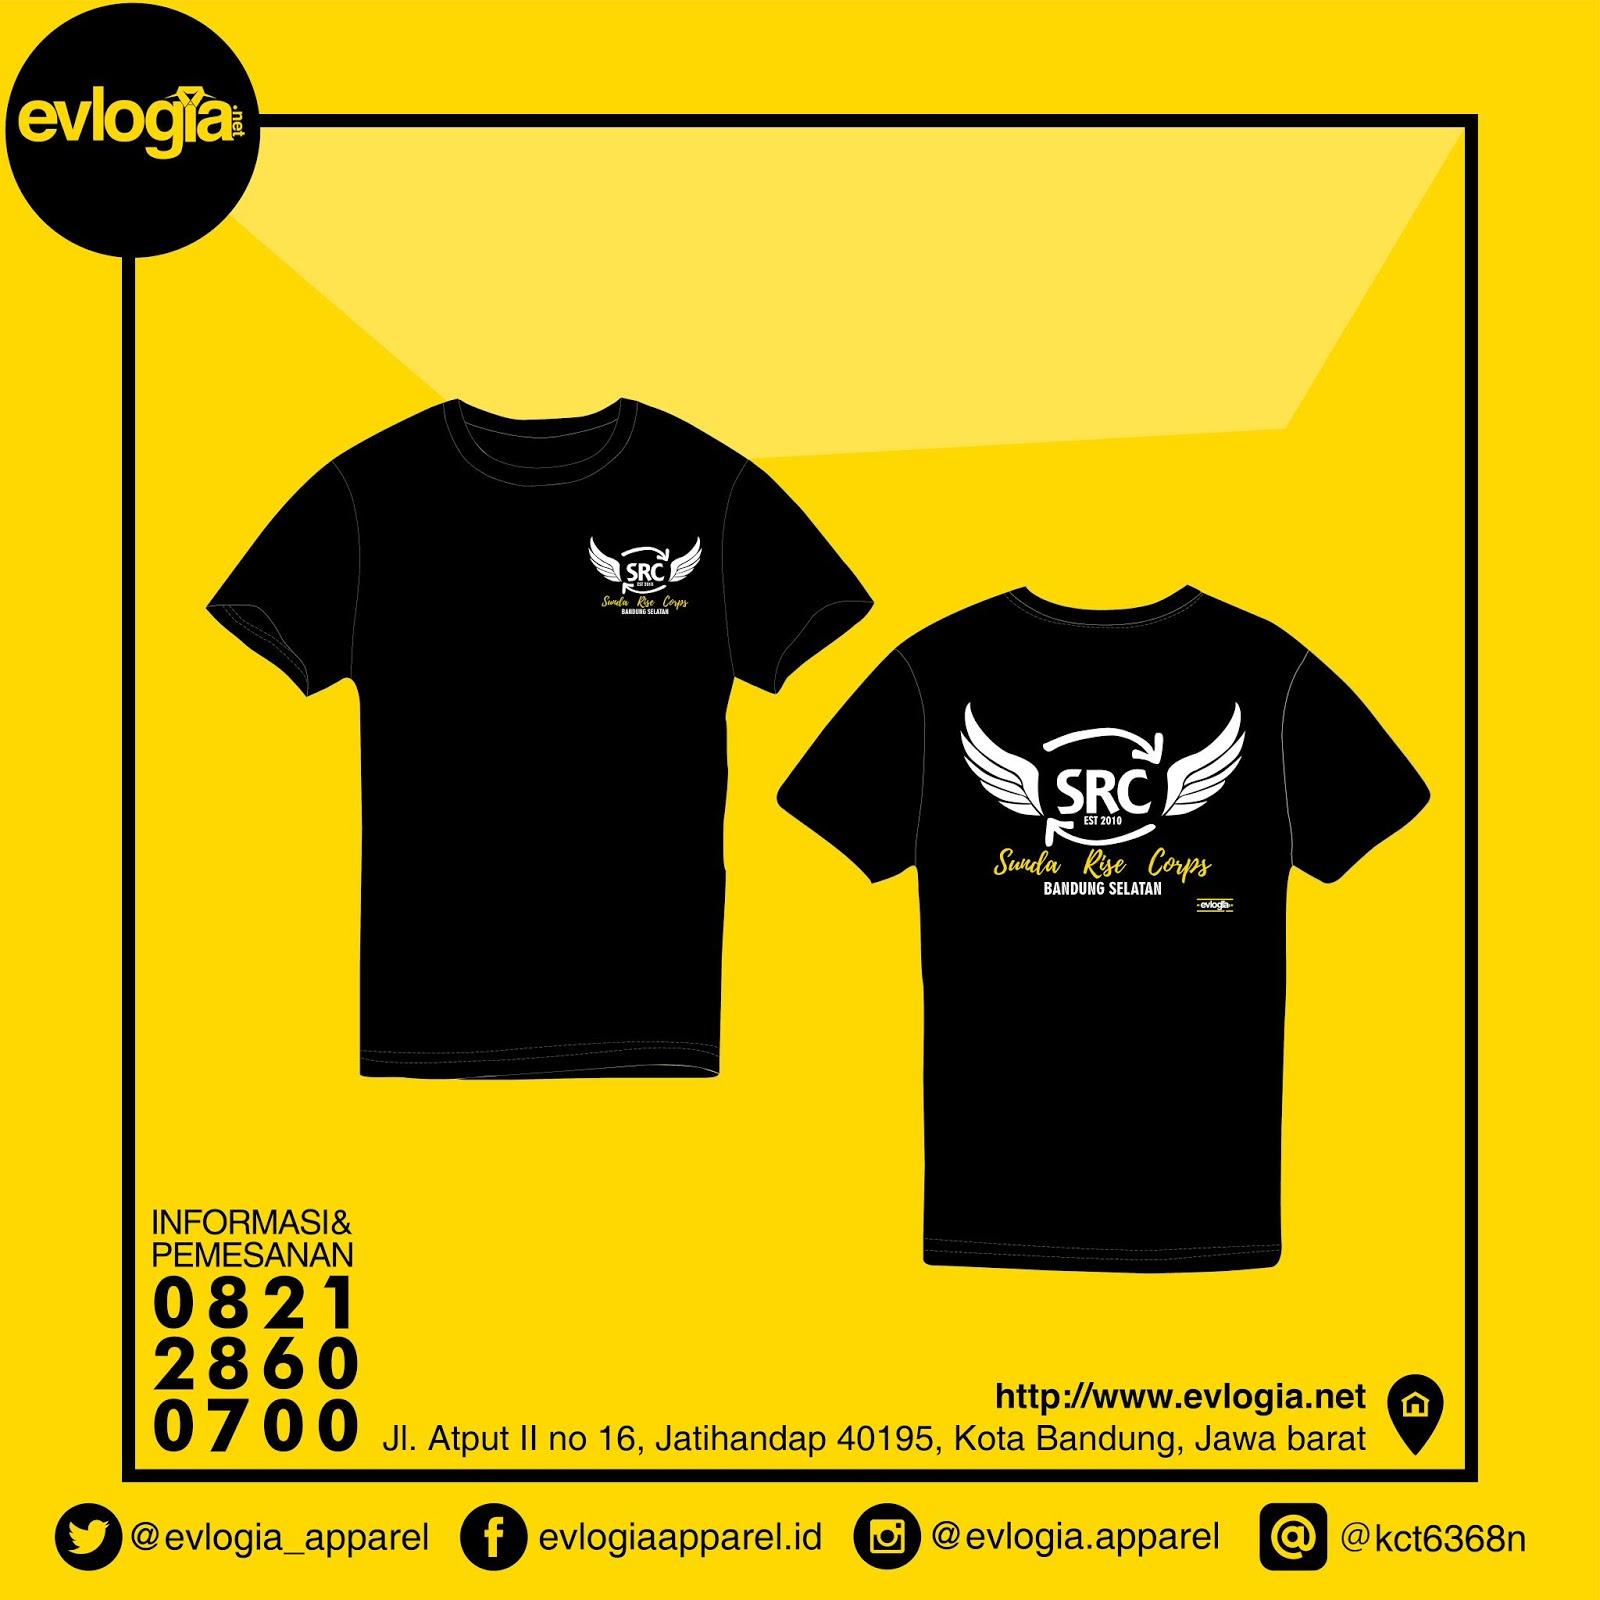 Bikin Kaos / Baju Komunitas Murah Berkualitas Bandung - Model Baju Komunitas